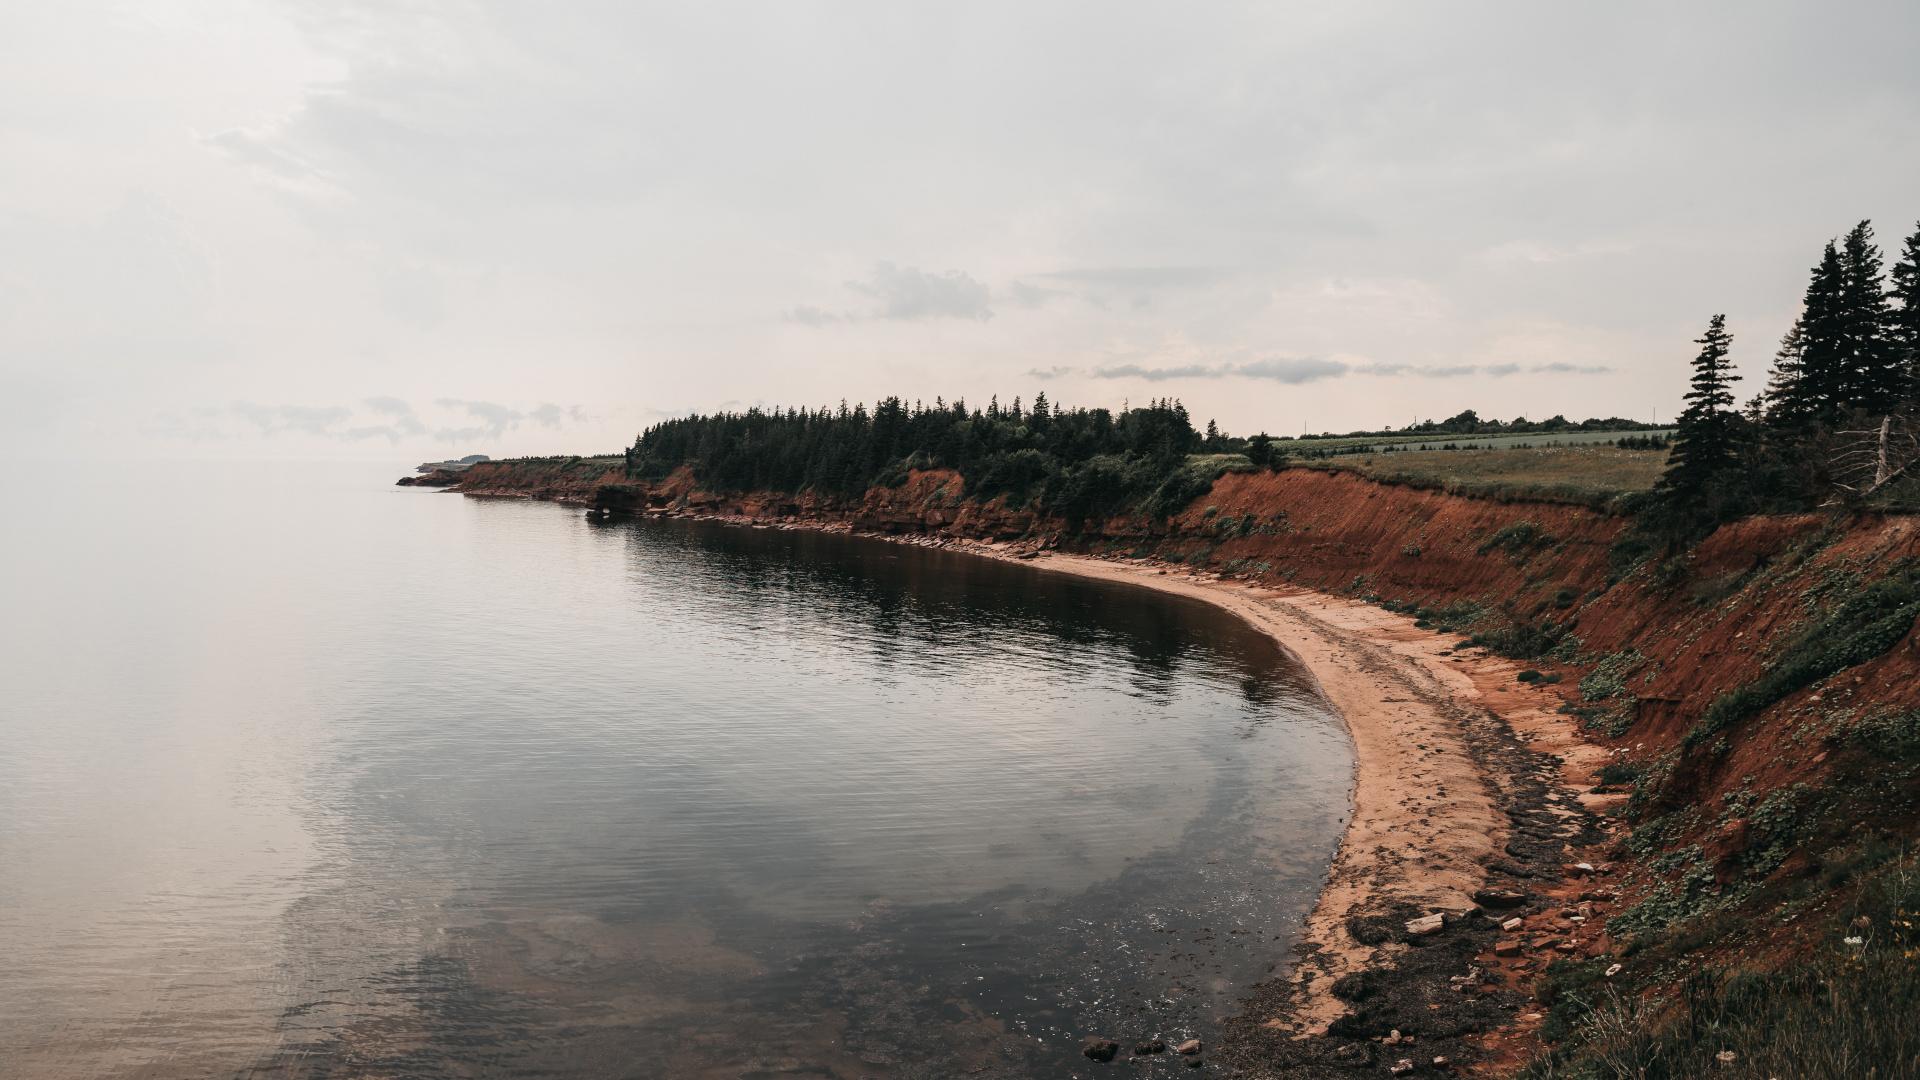 Canadian natural wonders | The Red Coast, Prince Edward Island